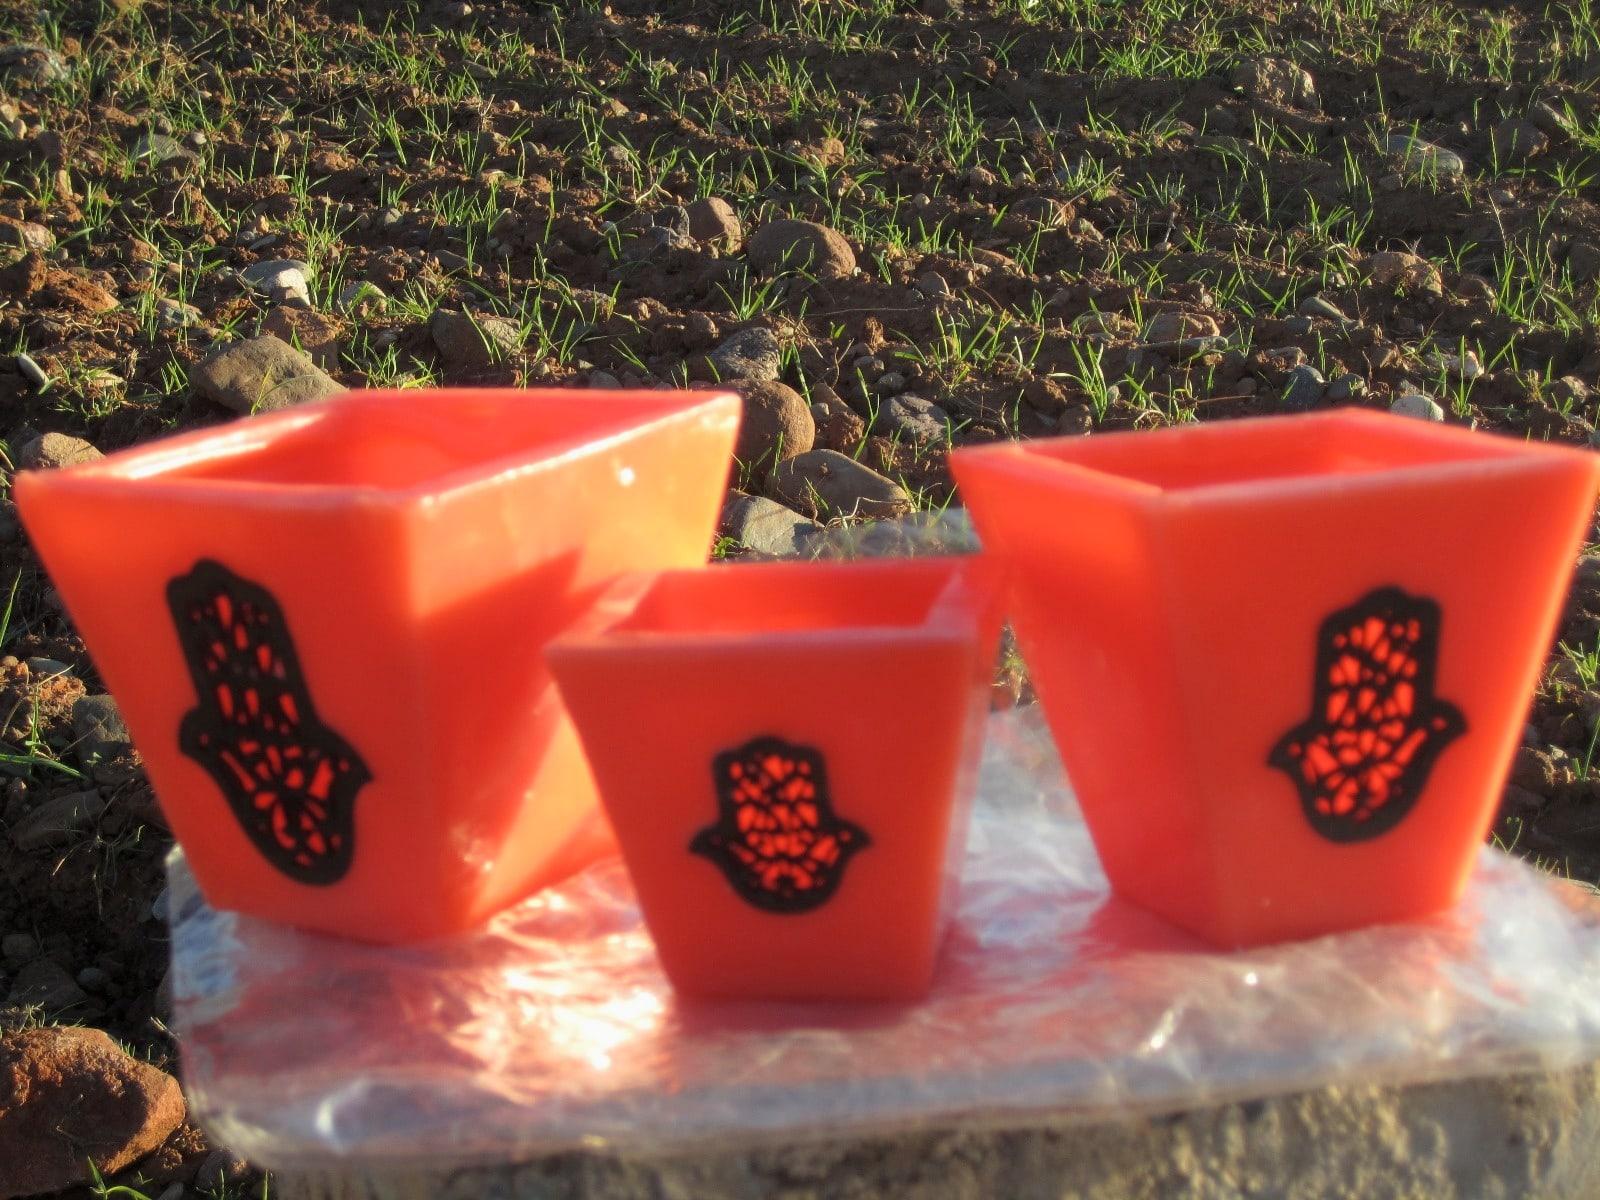 Cubic candle Dye, Wax, and Wood Orange Morocco